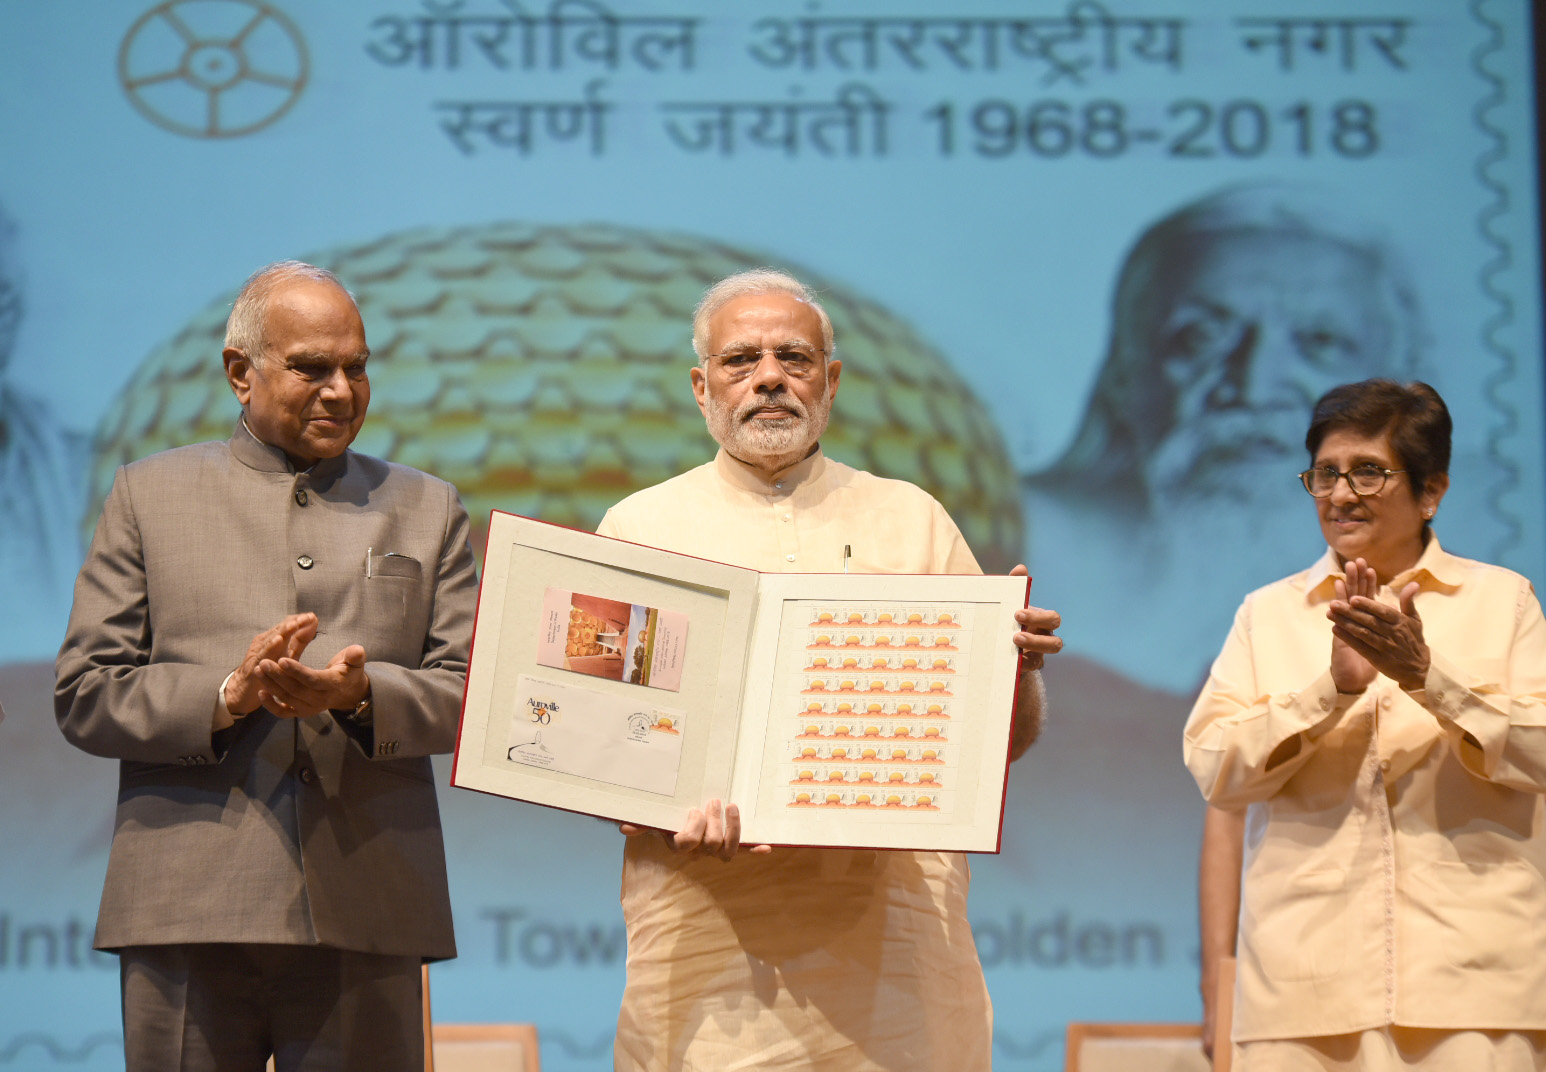 File:The Prime Minister, Shri Narendra Modi releasing the Commemorative Postage Stamp on Golden Jubilee Celebrations of Auroville, in Puducherry.jpg - Wikimedia Commons